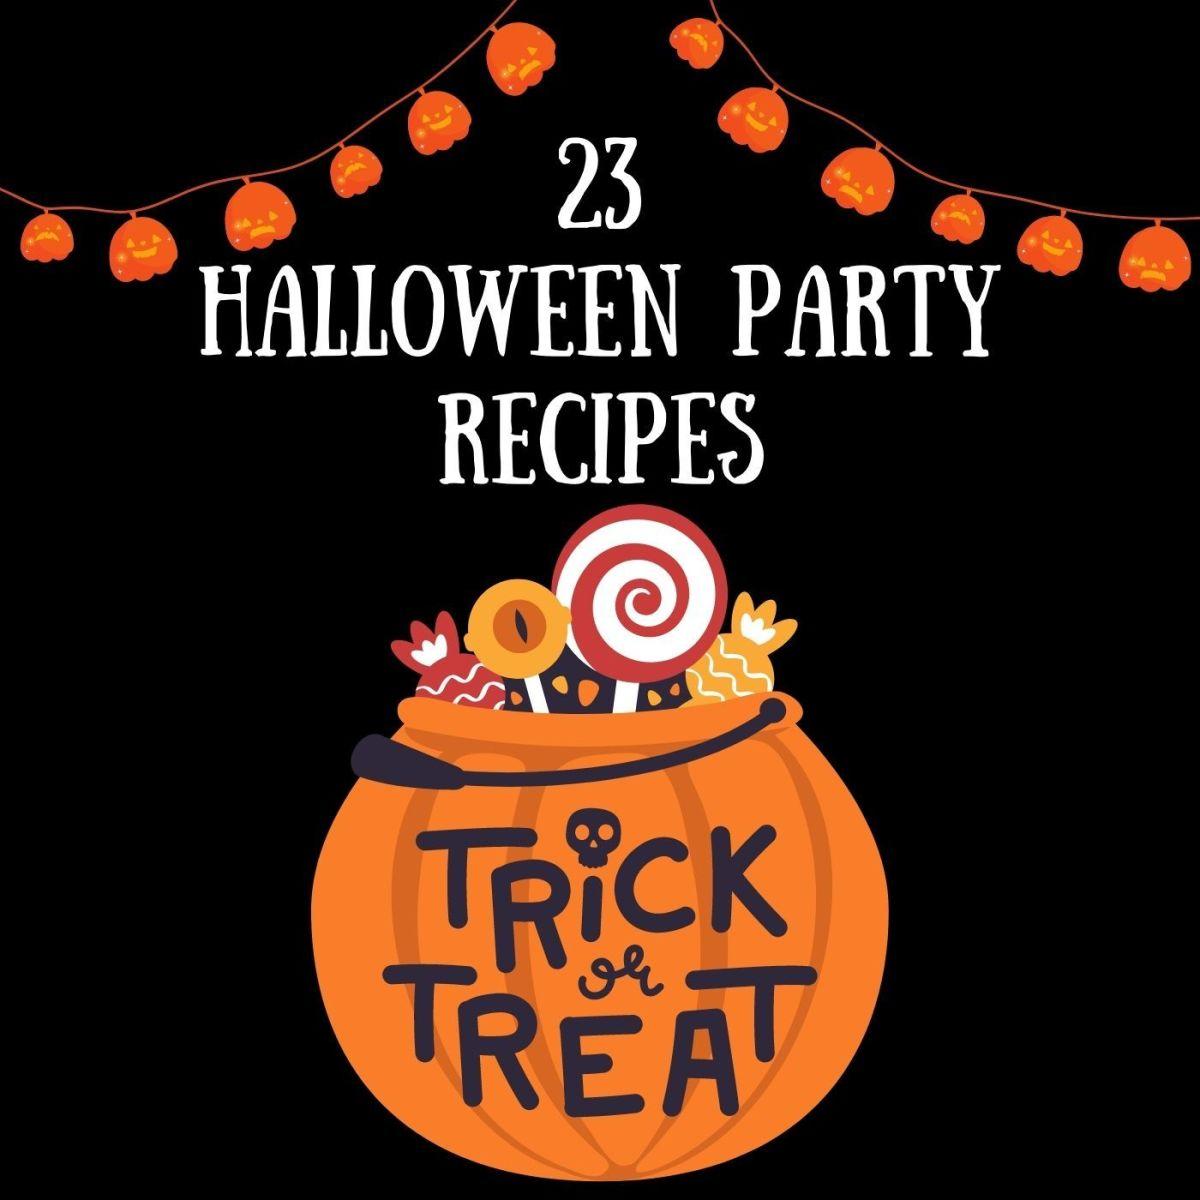 23 Easy Halloween Party Recipe Ideas